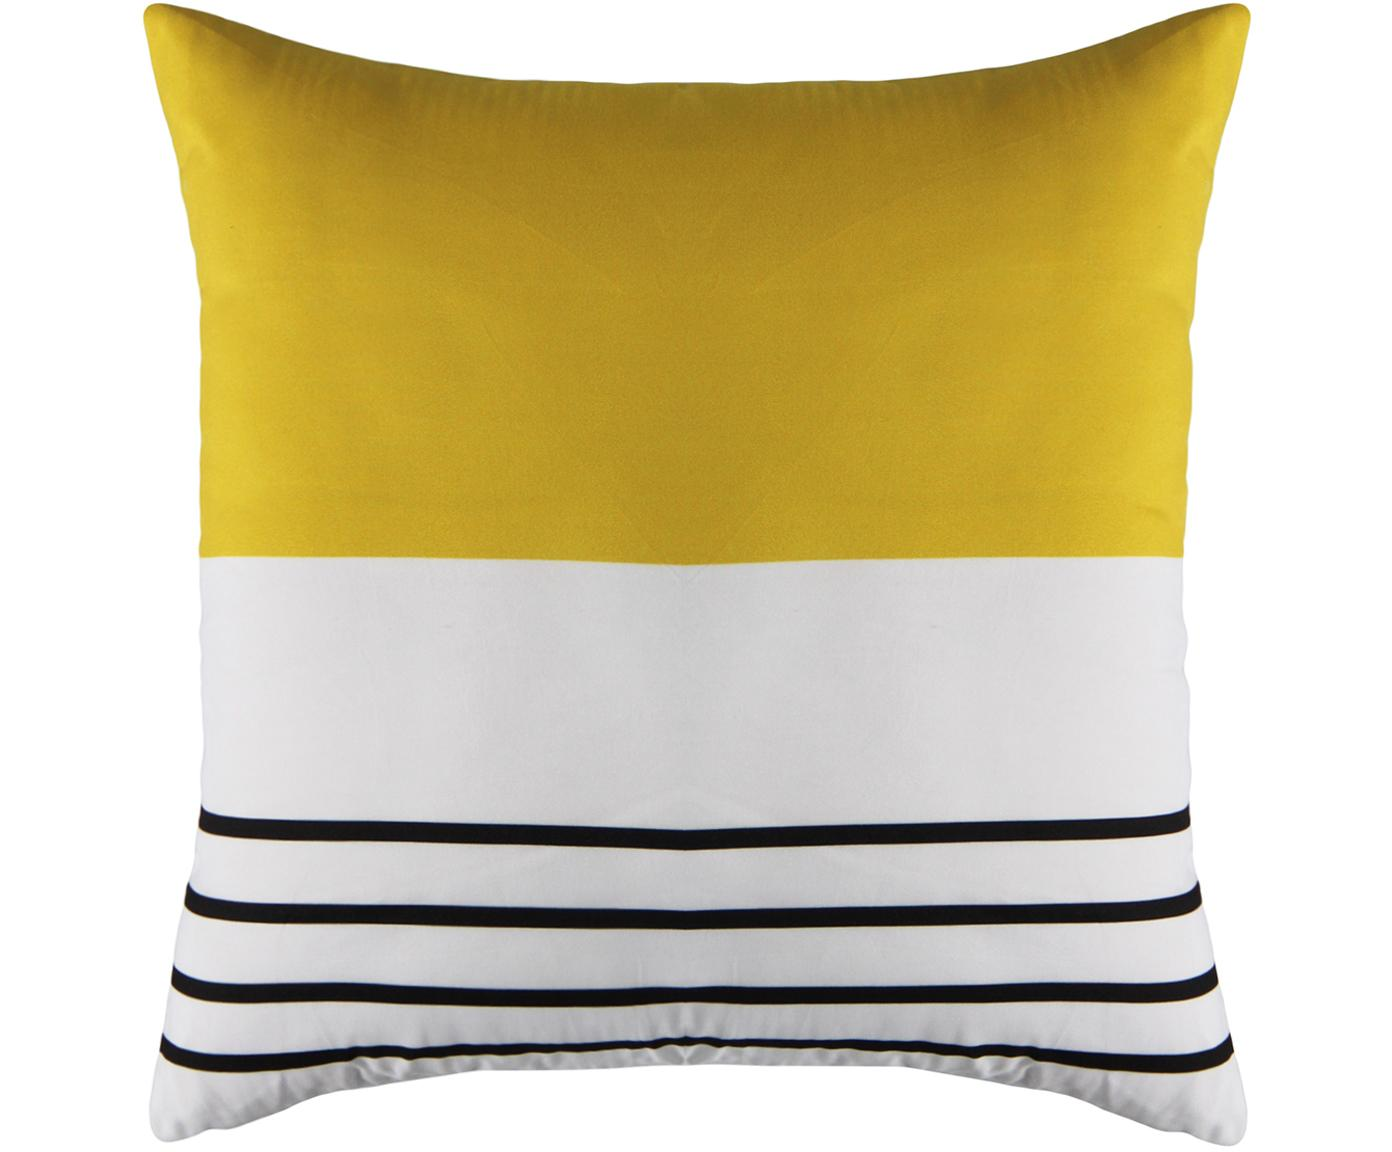 Funda de cojín Magdalena, Poliéster, Blanco, amarillo, negro, An 40 x L 40 cm